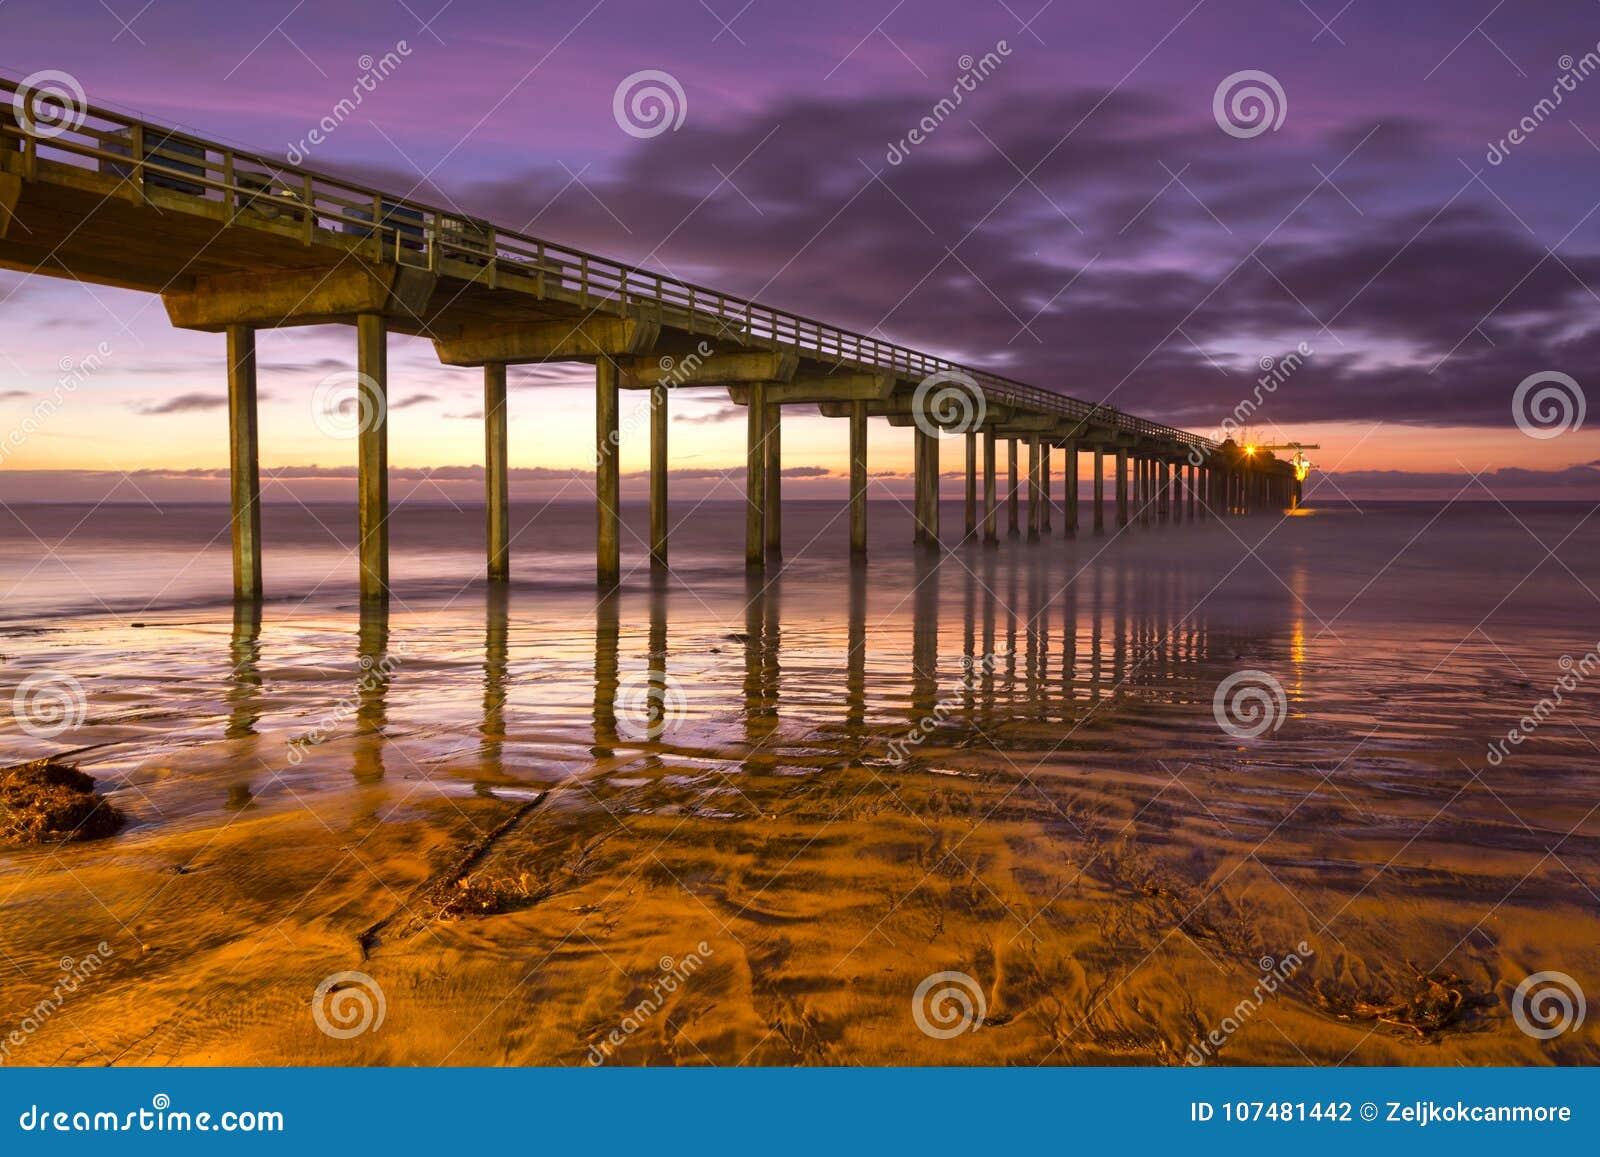 Playa San Diego California de Scripps Pier Sunset Colors La Jolla Shores